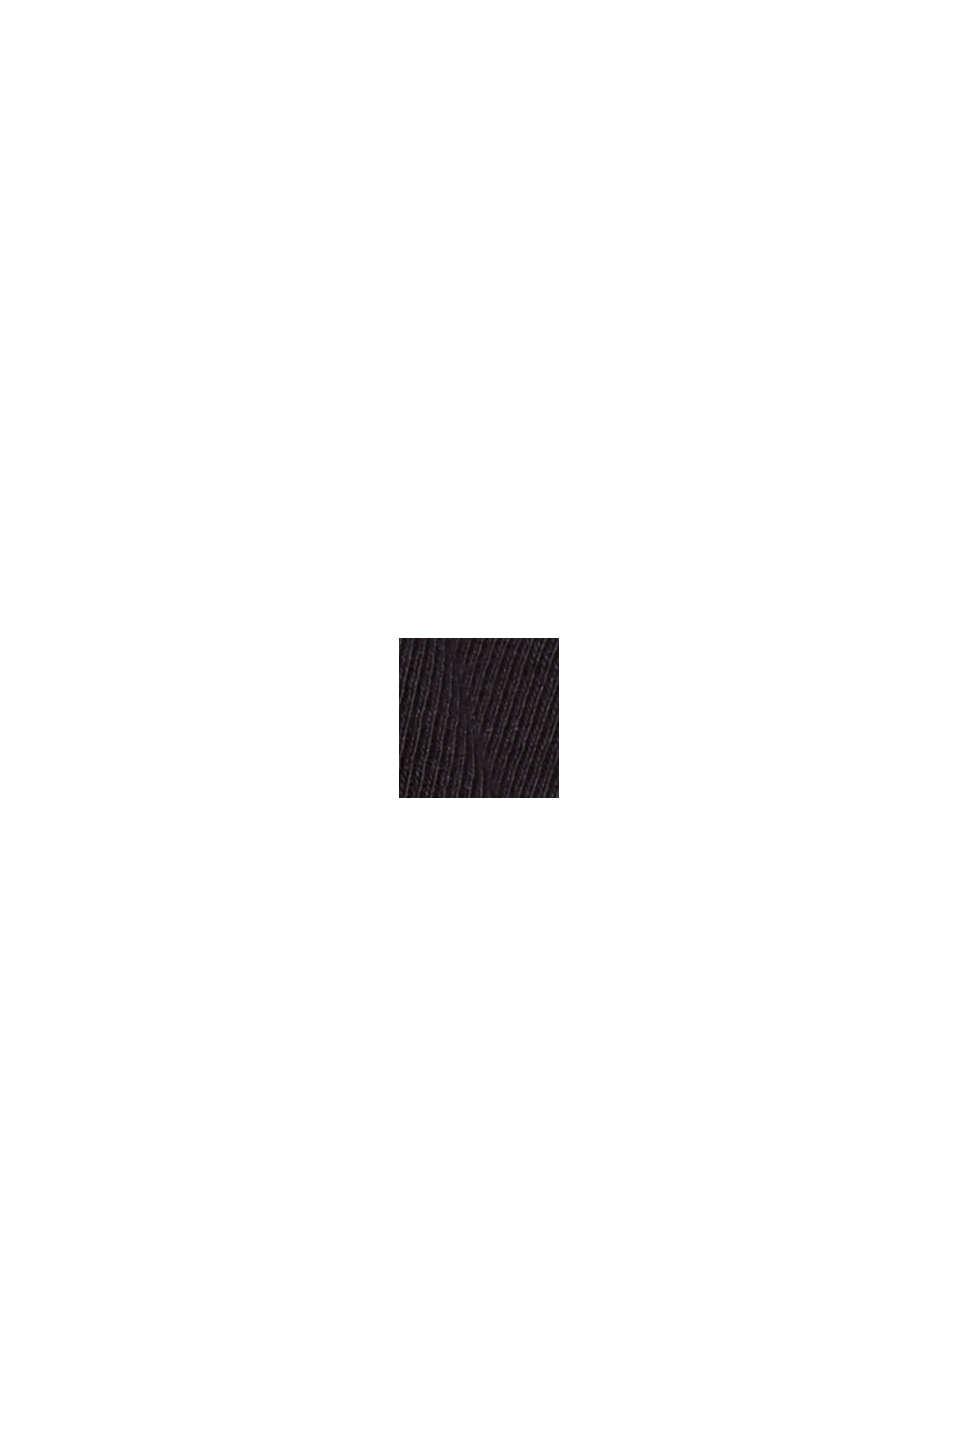 Camiseta de manga larga con cuello mao, 100 % algodón ecológico, BLACK, swatch